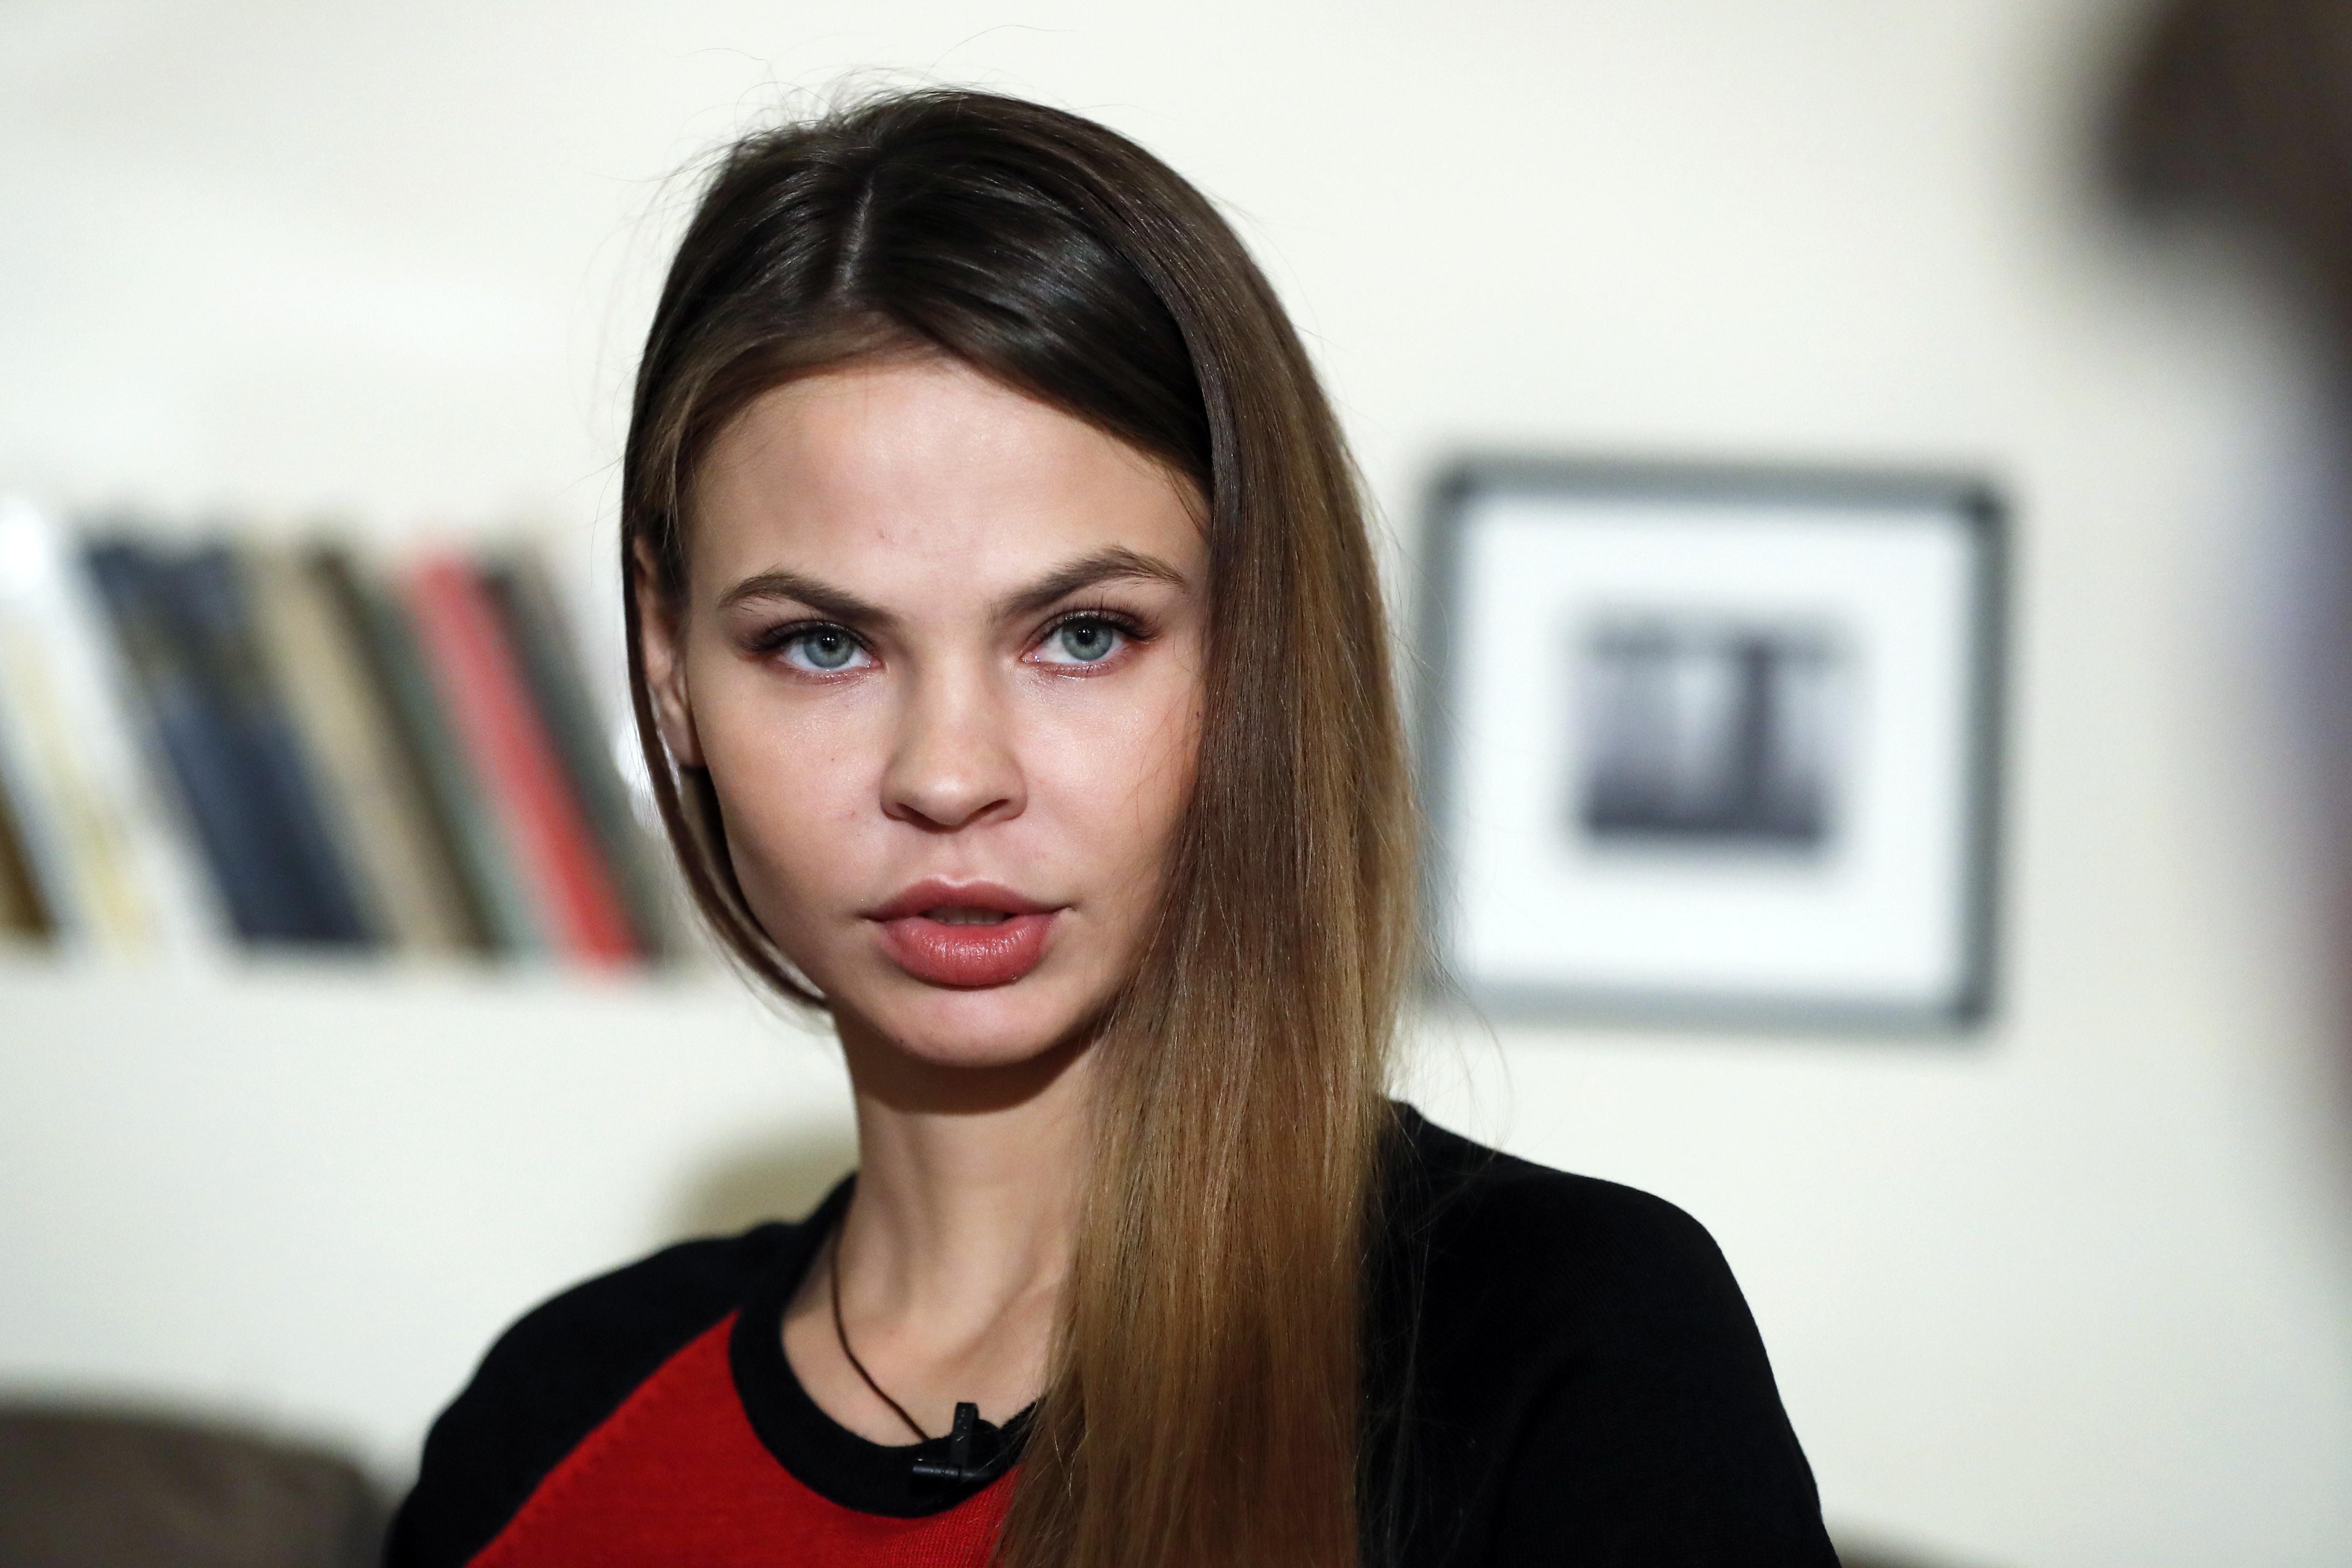 Hacked Nastya Rybka nudes (78 photo), Topless, Bikini, Selfie, butt 2019